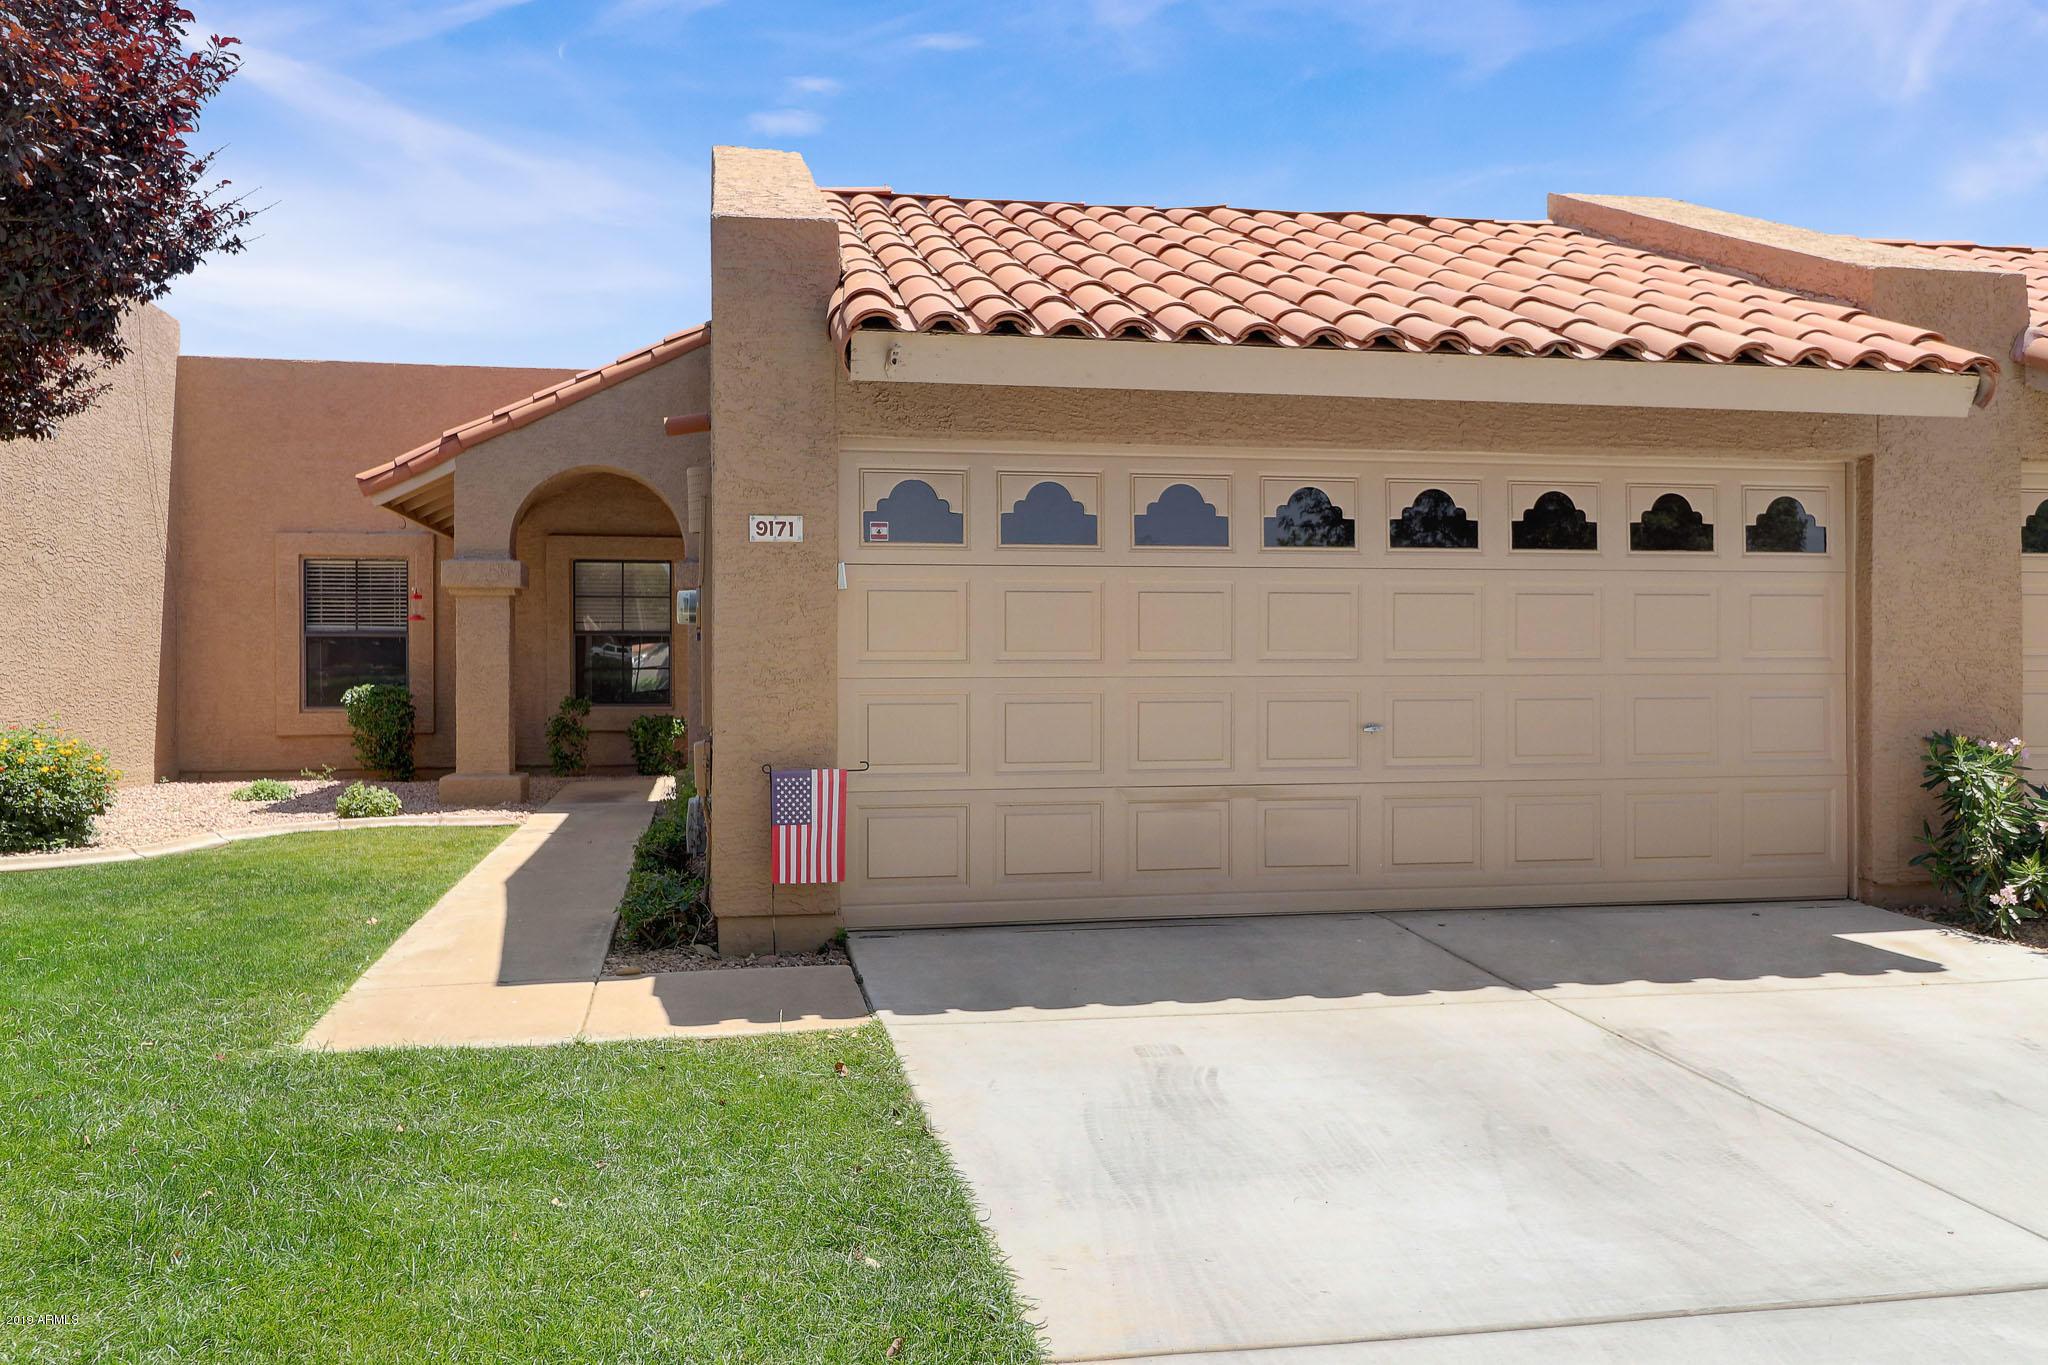 9171 E Winchcomb Drive Scottsdale 85260